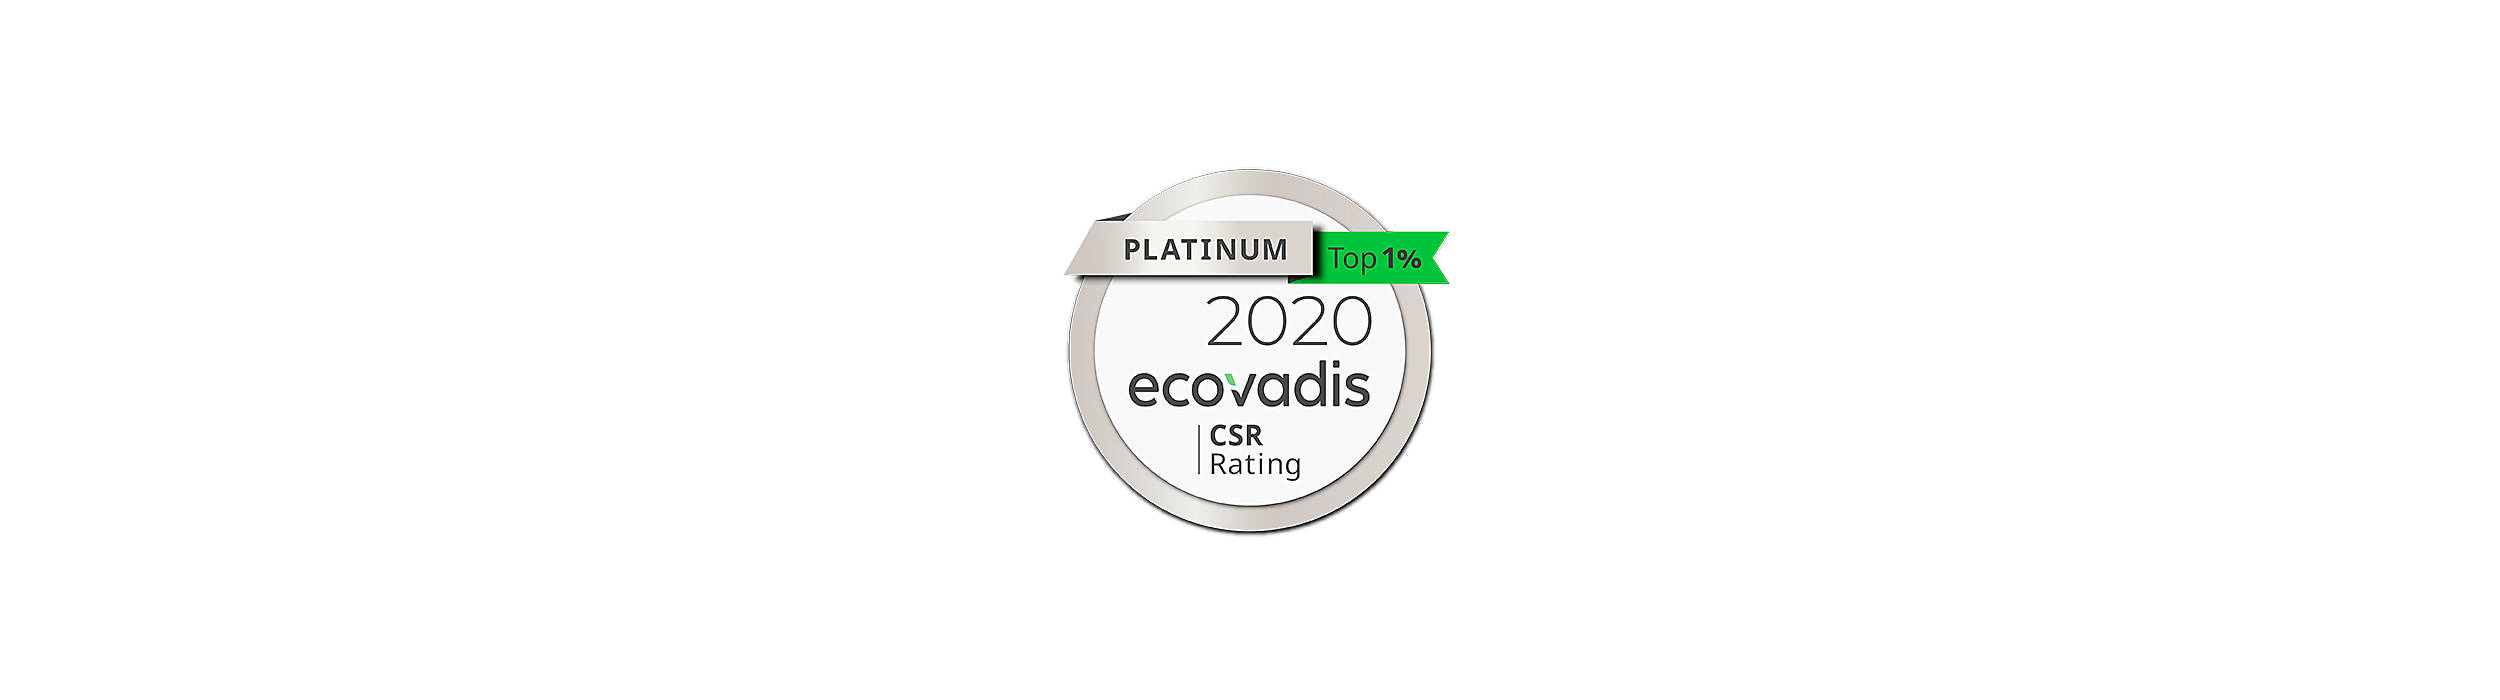 Toyota Material Handling reçoit la médaille Platine d'EcoVadis